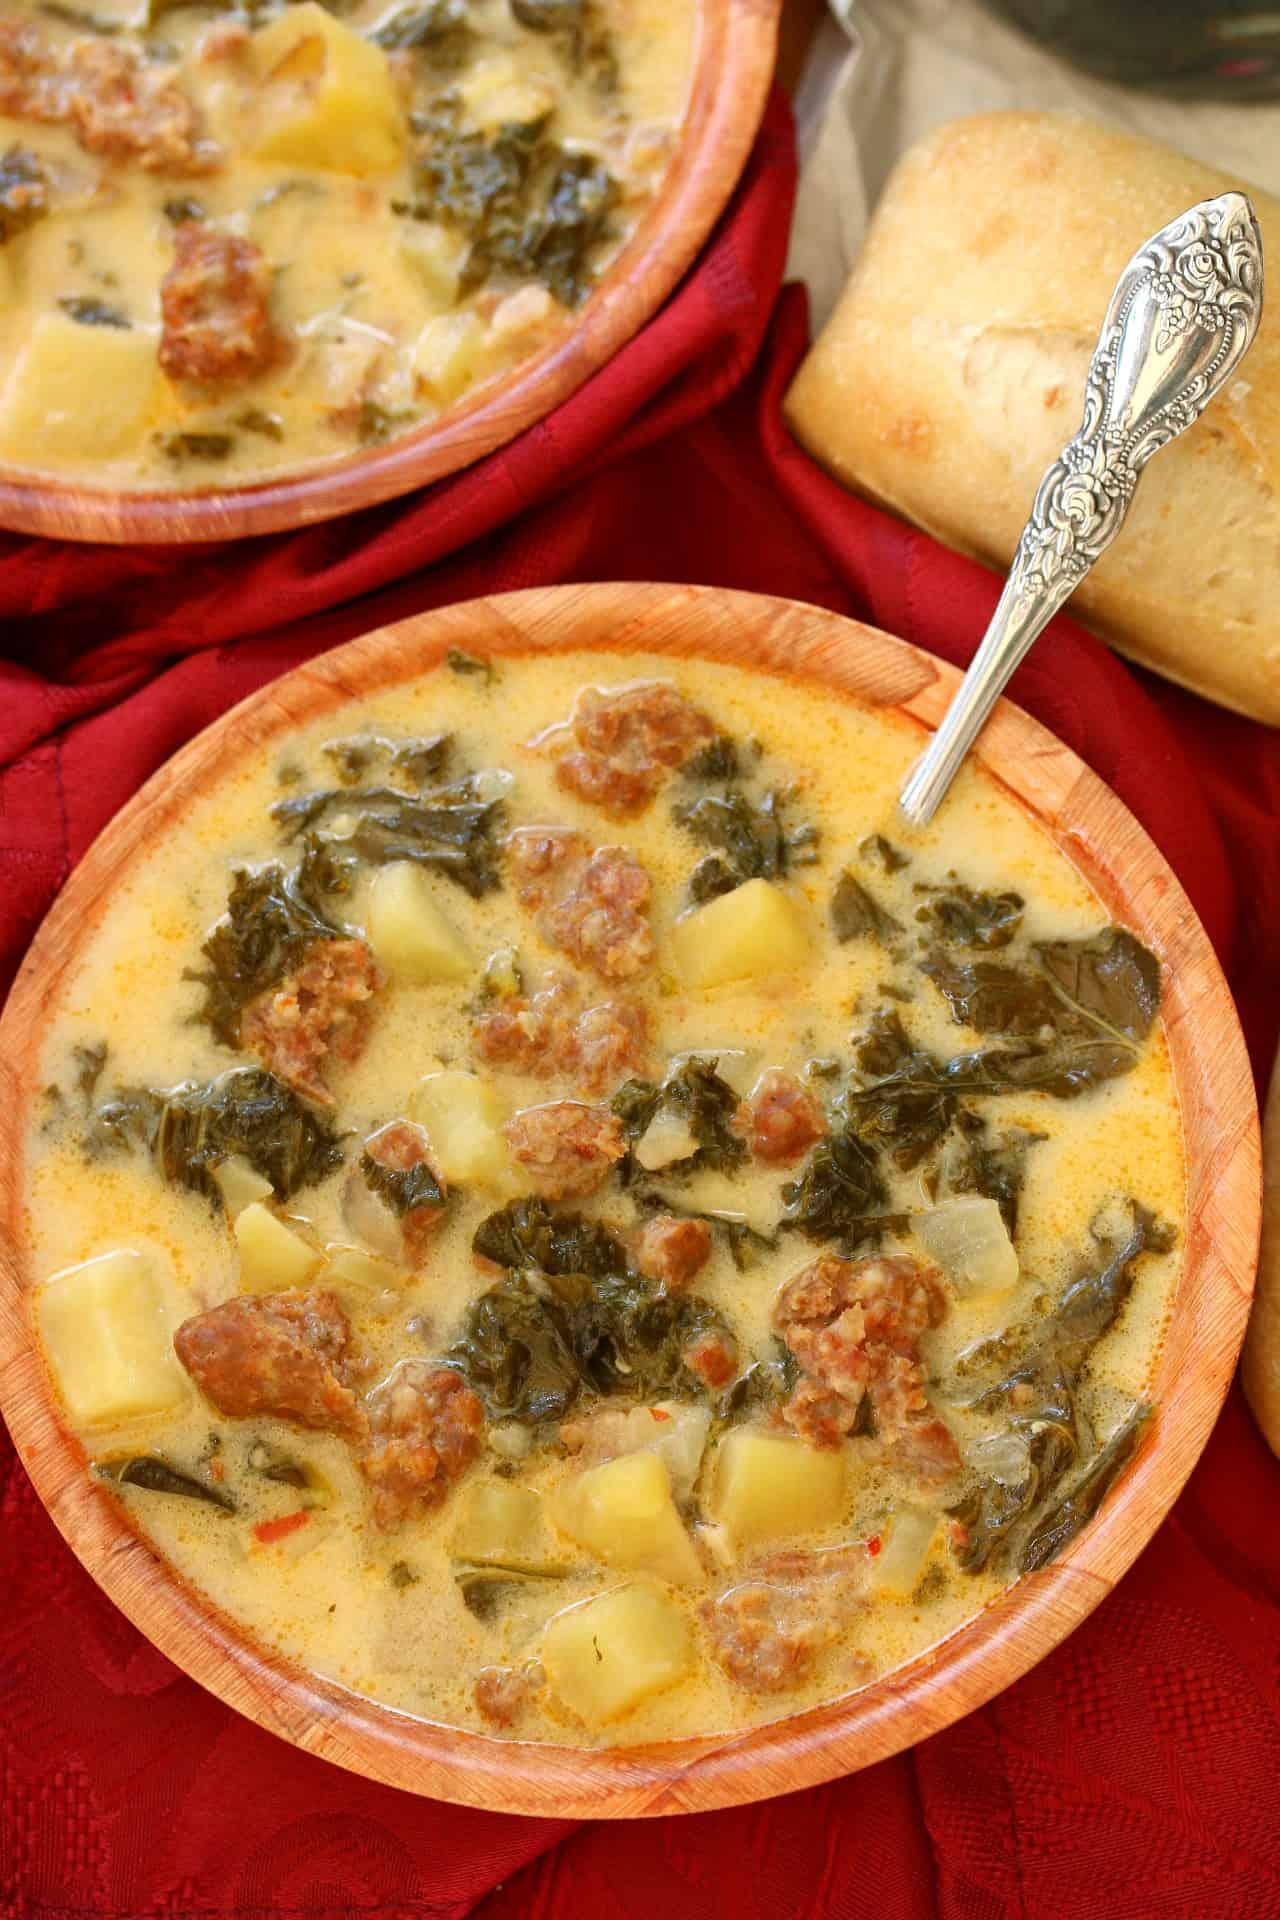 Copycat-OliveGarden-Zuppa-Tuscana-Soup